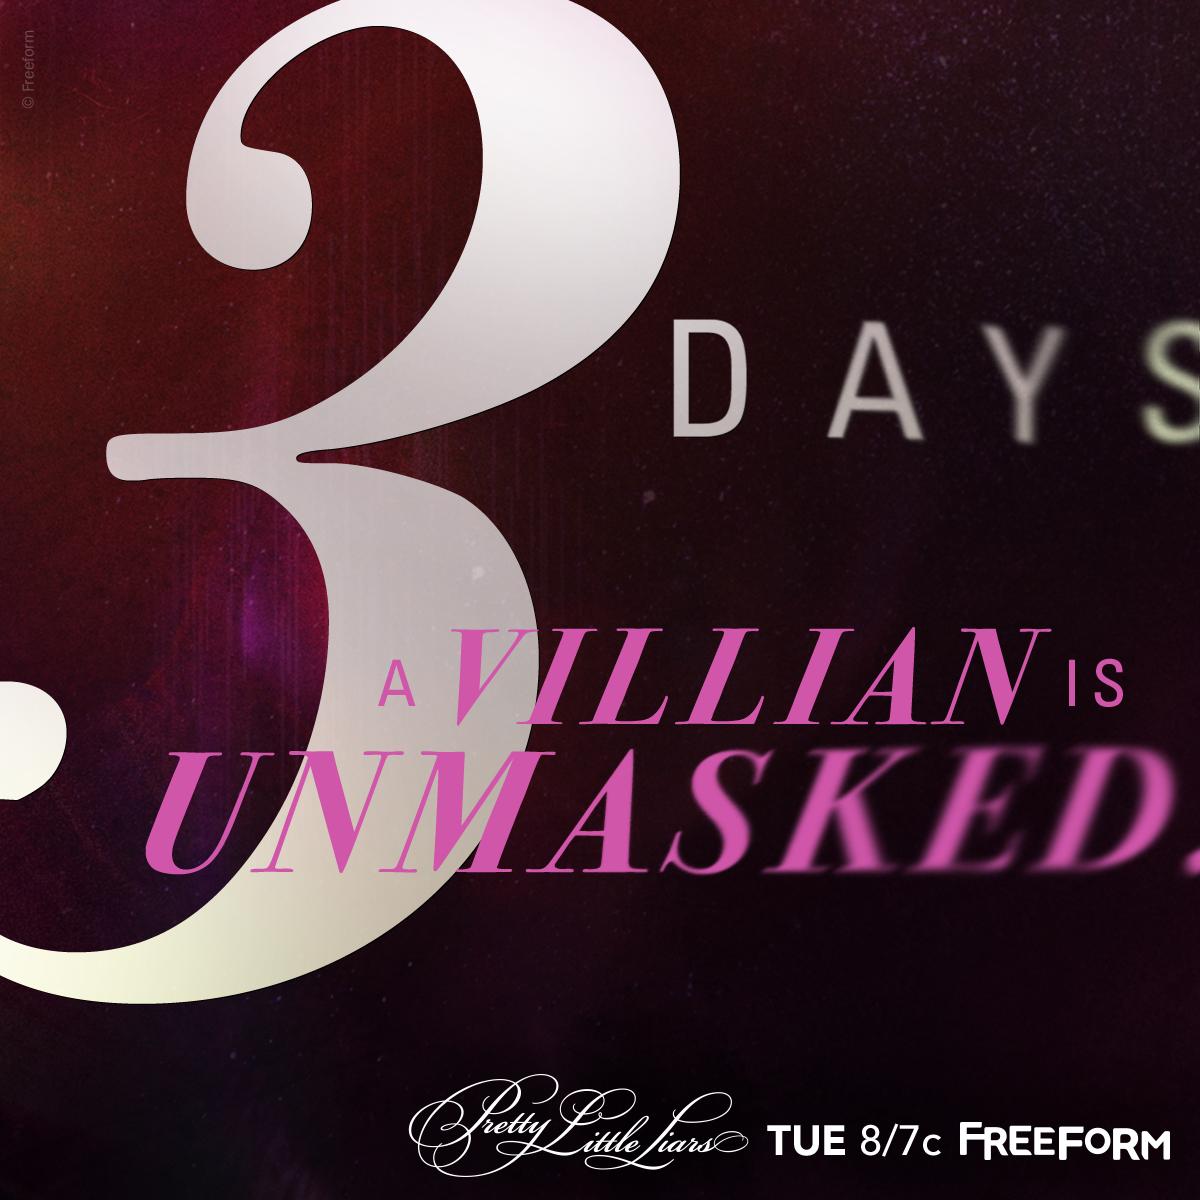 Pretty Little Liars - Here's What We Know Will Happen In The Pretty Little Liars Season 6 Finale! - 1006